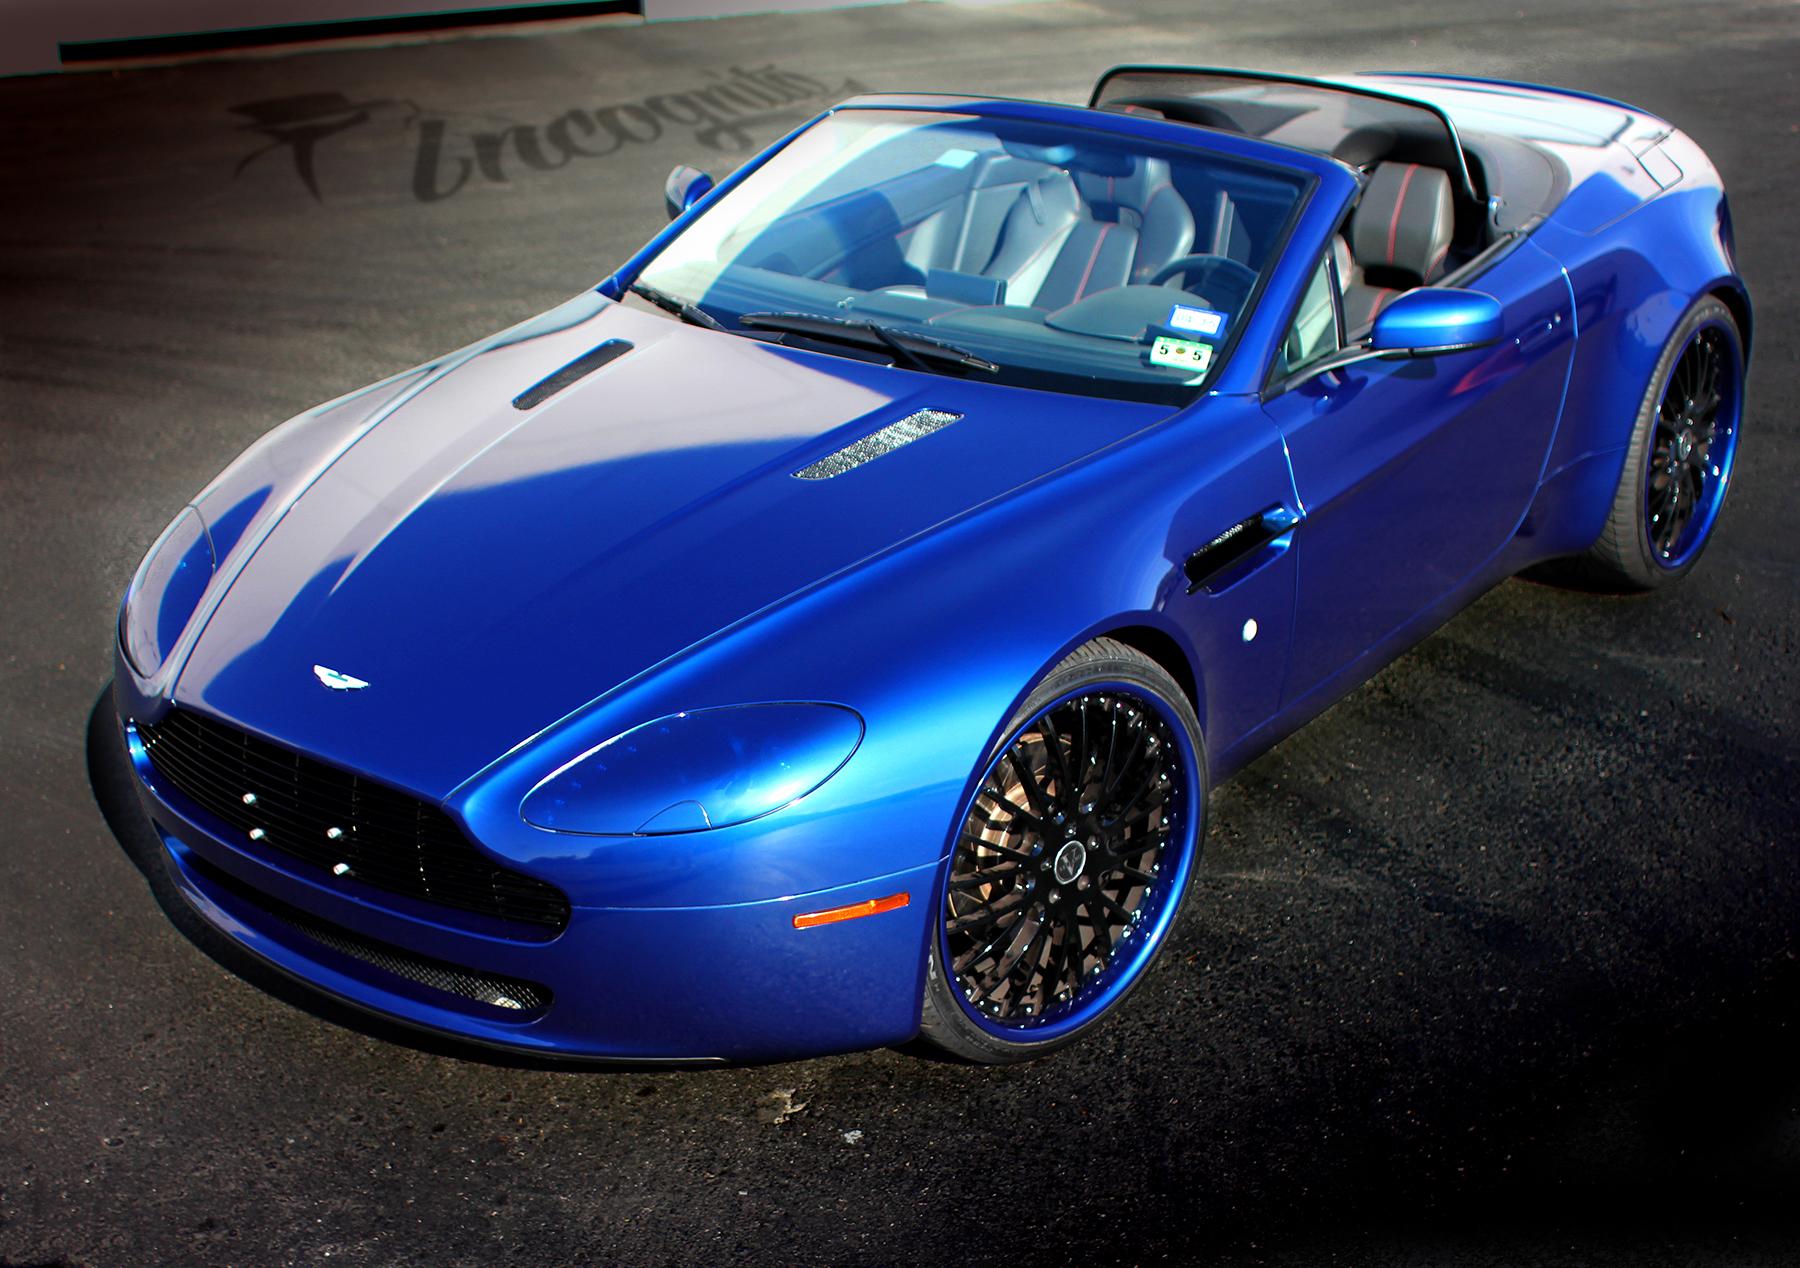 Aston Martin Vantage Dark Blue Metallic.jpg